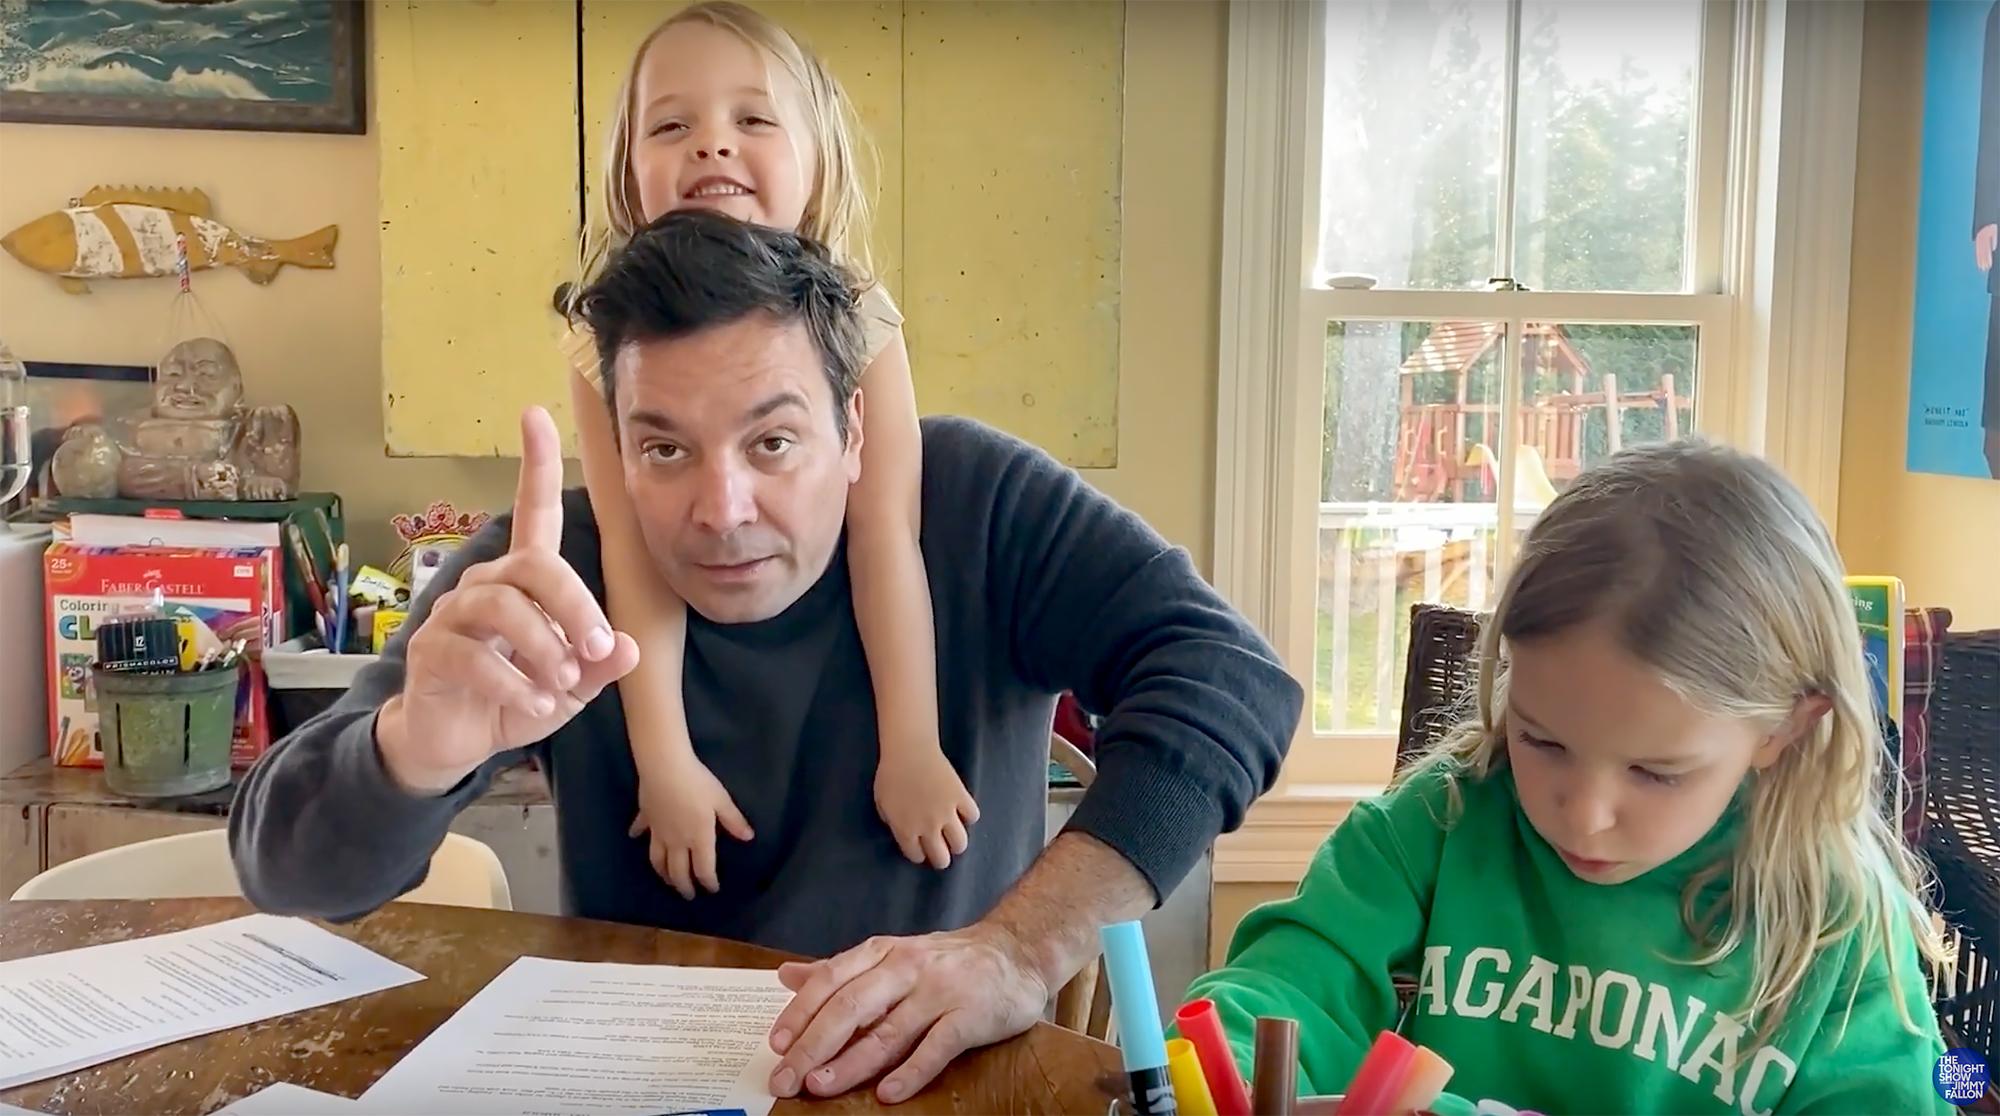 Jimmy Fallon Kids Hilariously Crash TV Show Appearances